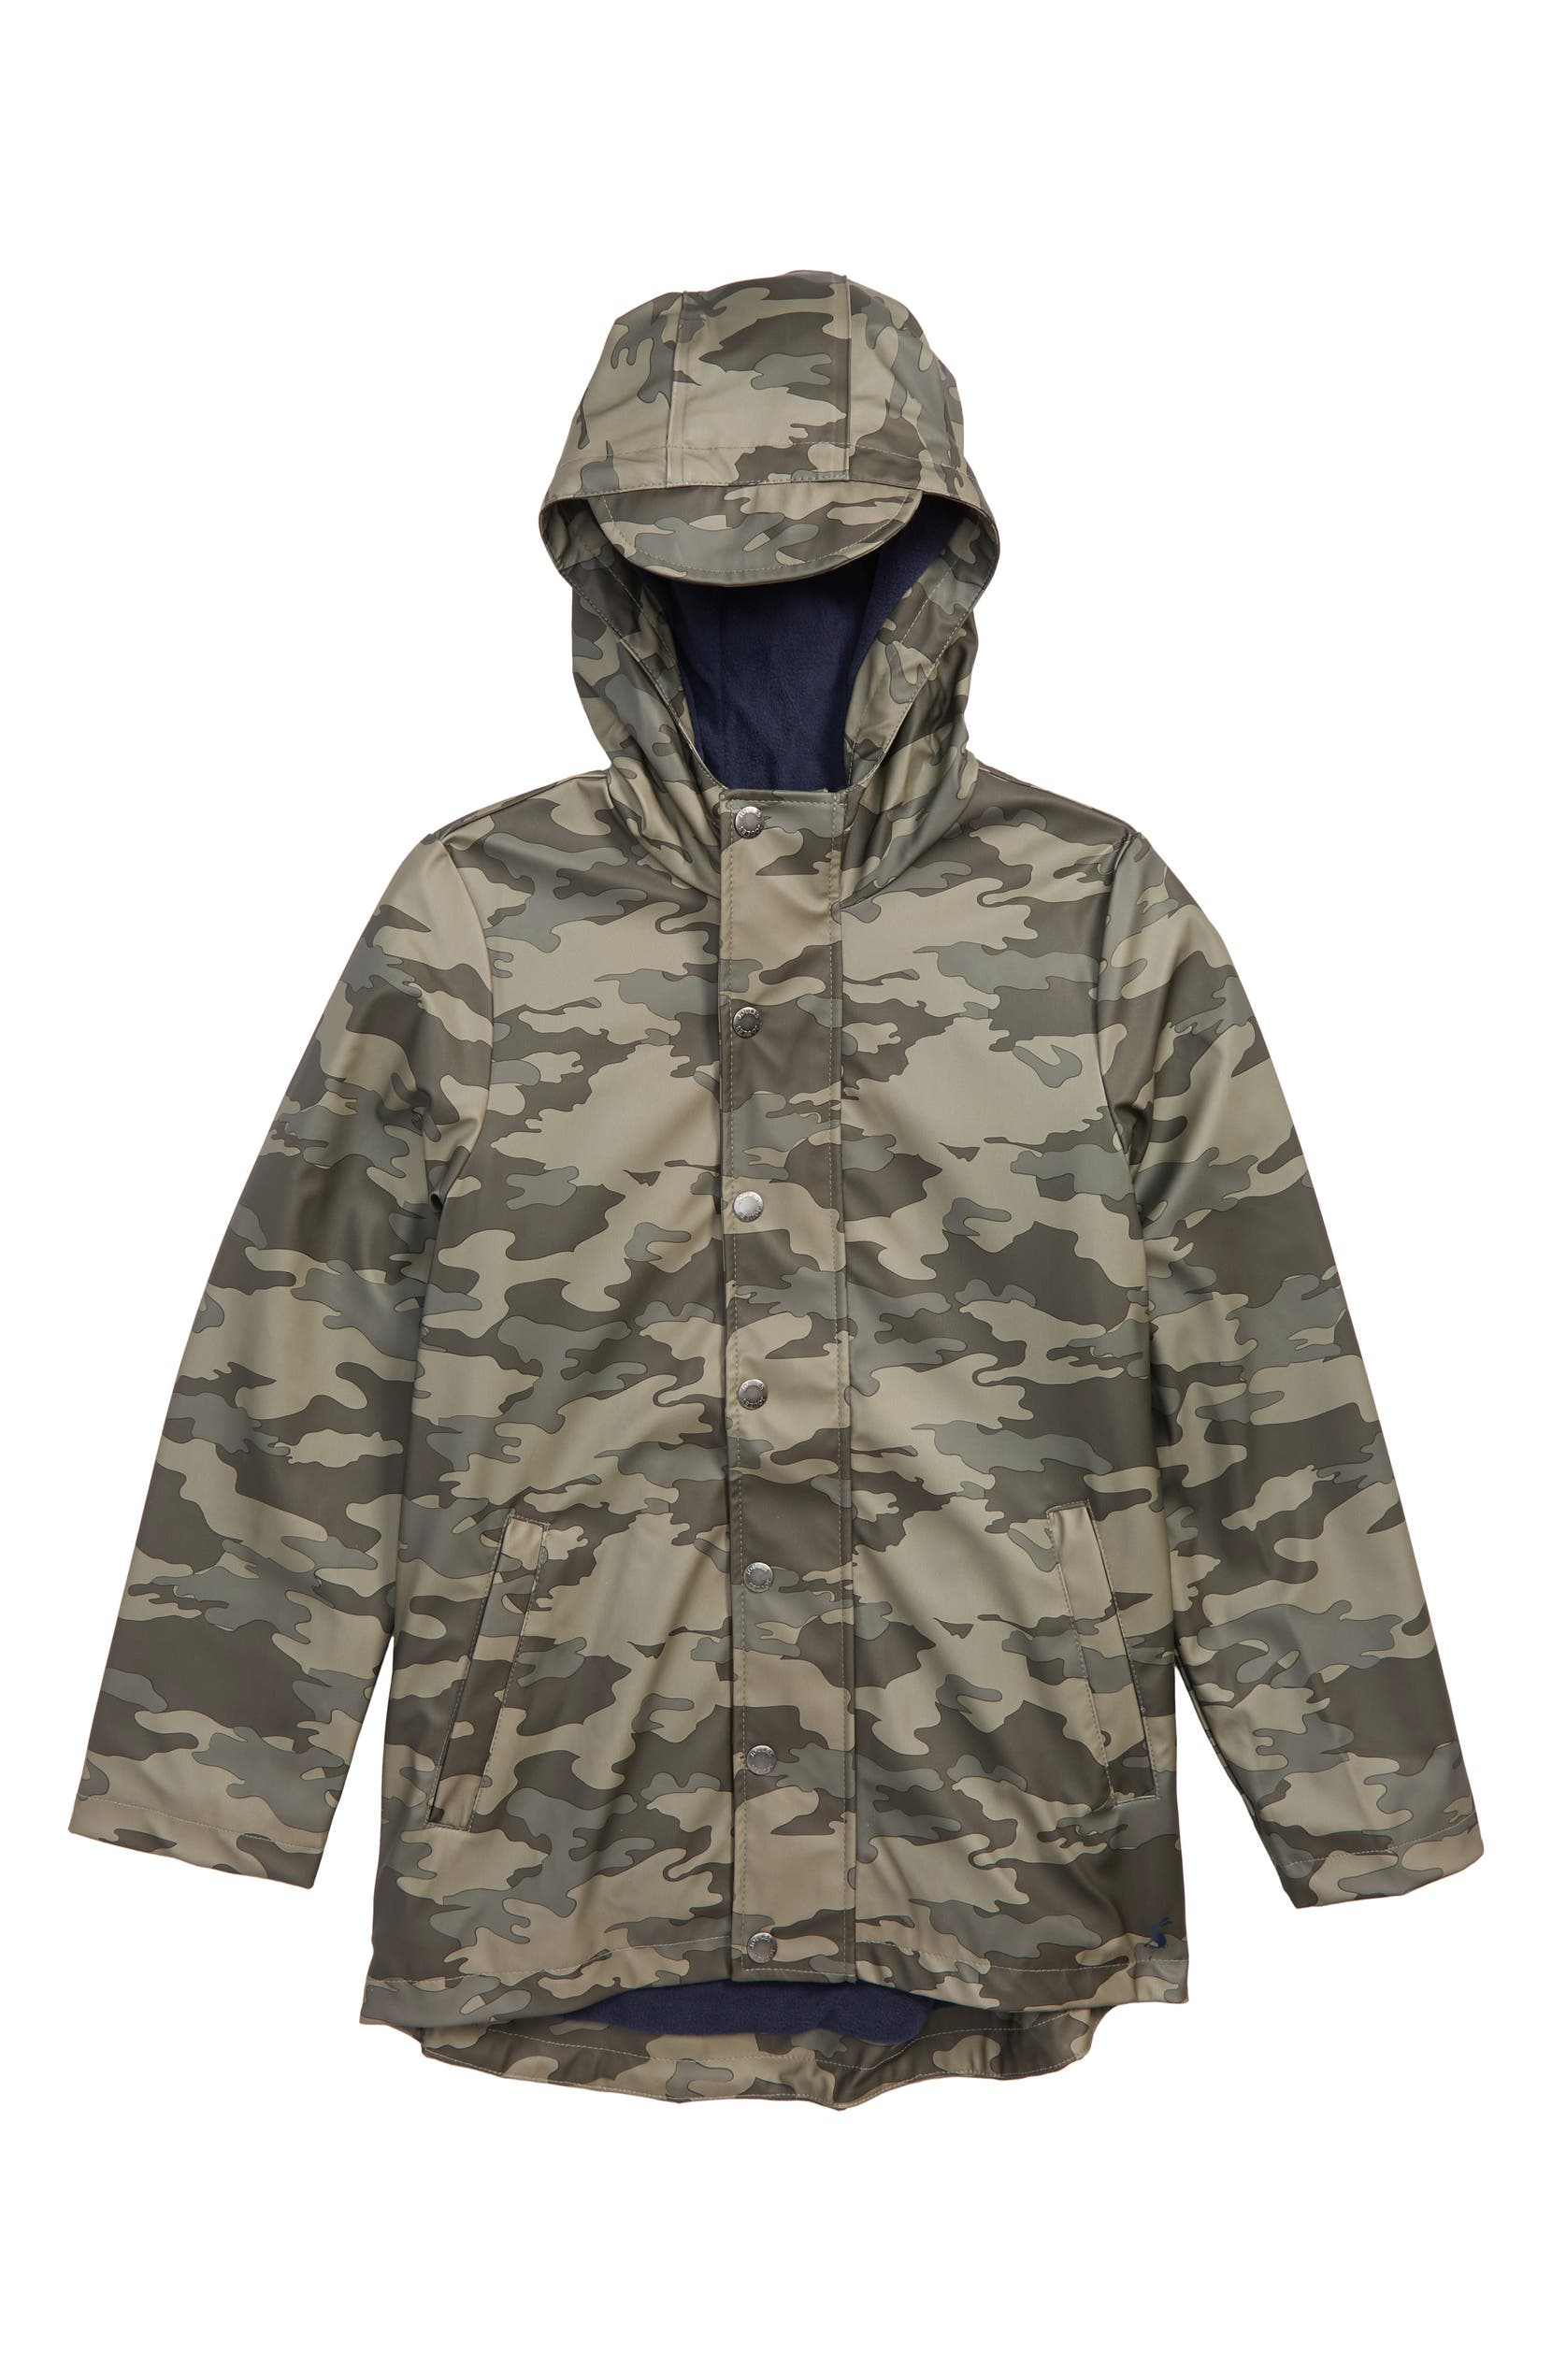 c4522ba3b Joules Camo Waterproof Rubber Raincoat (Big Boys)